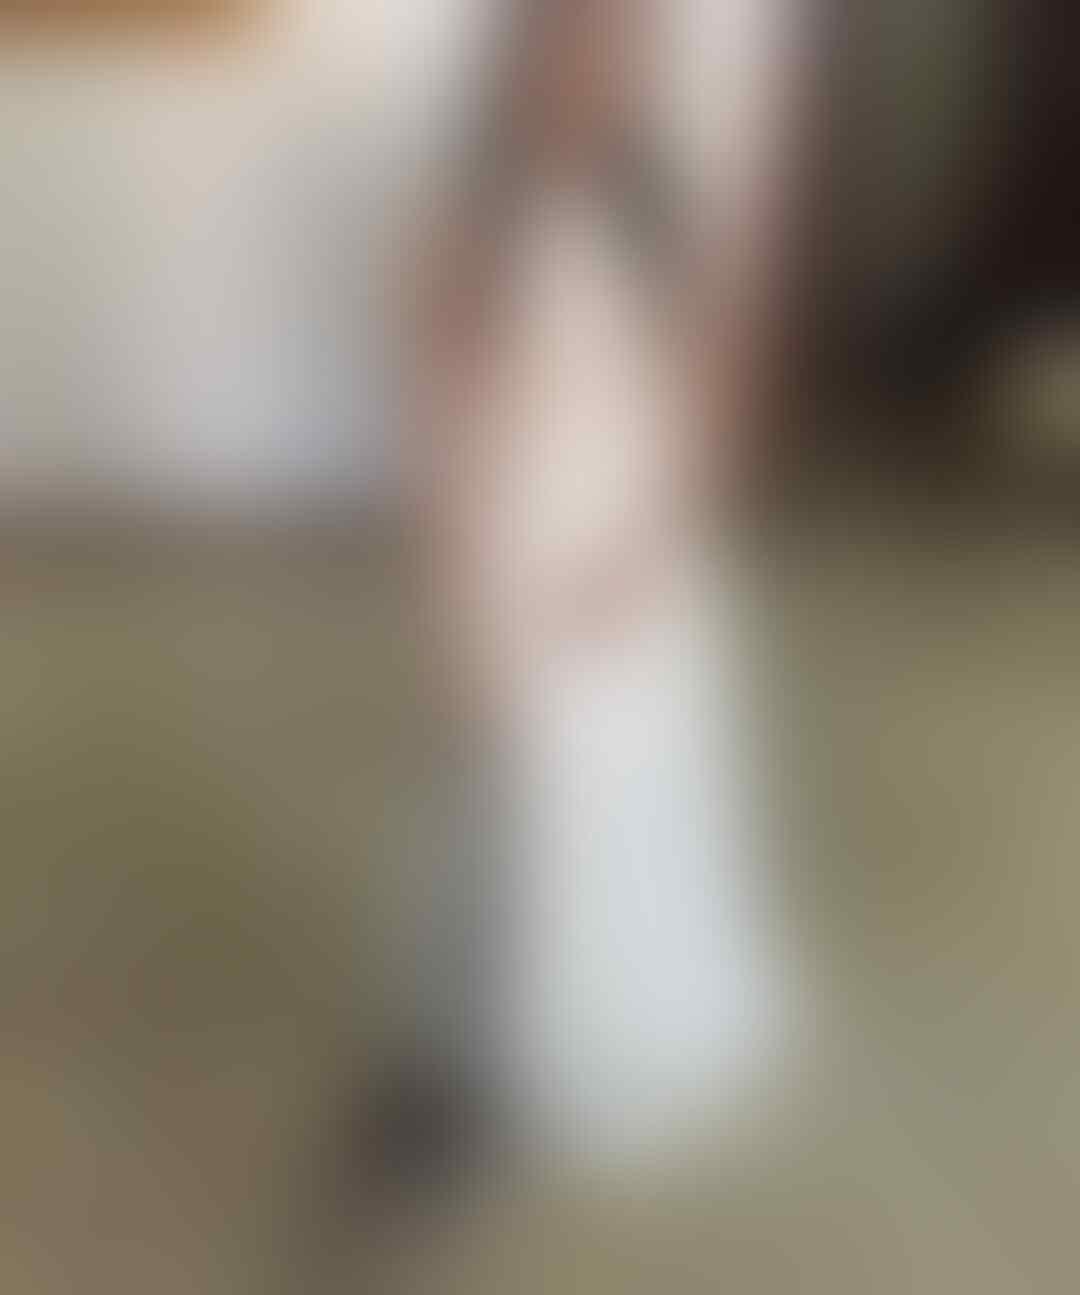 10 Potret Sasi Asmara, Putri Anjasmara yang Kini Beranjak Dewasa